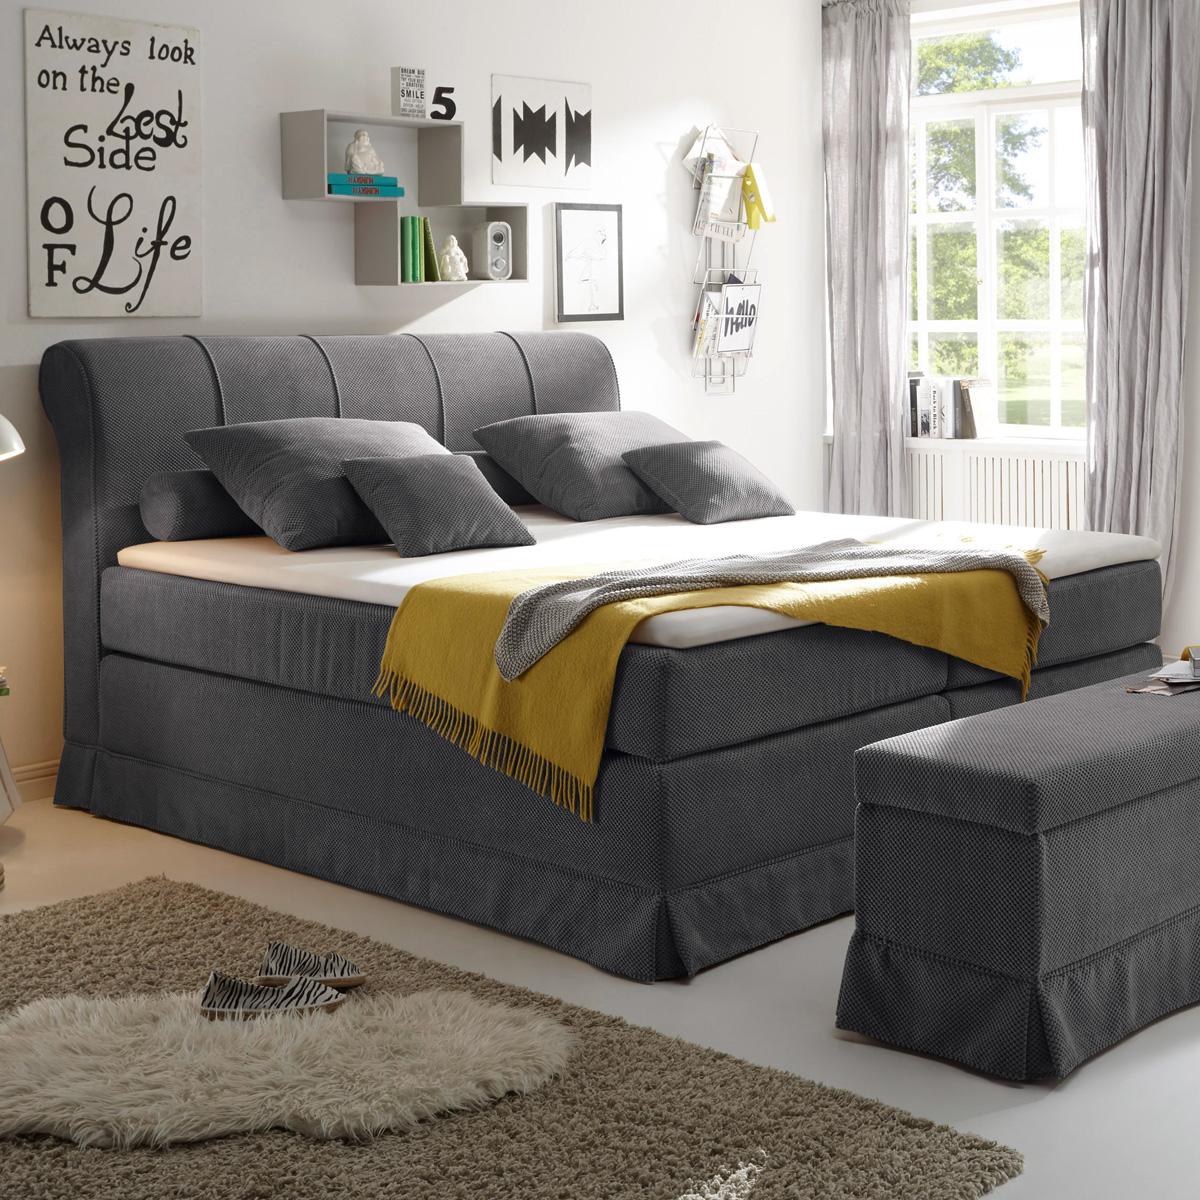 boxspringbett carson 1 bett schlafzimmerbett beige anthrazit braun mit topper ebay. Black Bedroom Furniture Sets. Home Design Ideas